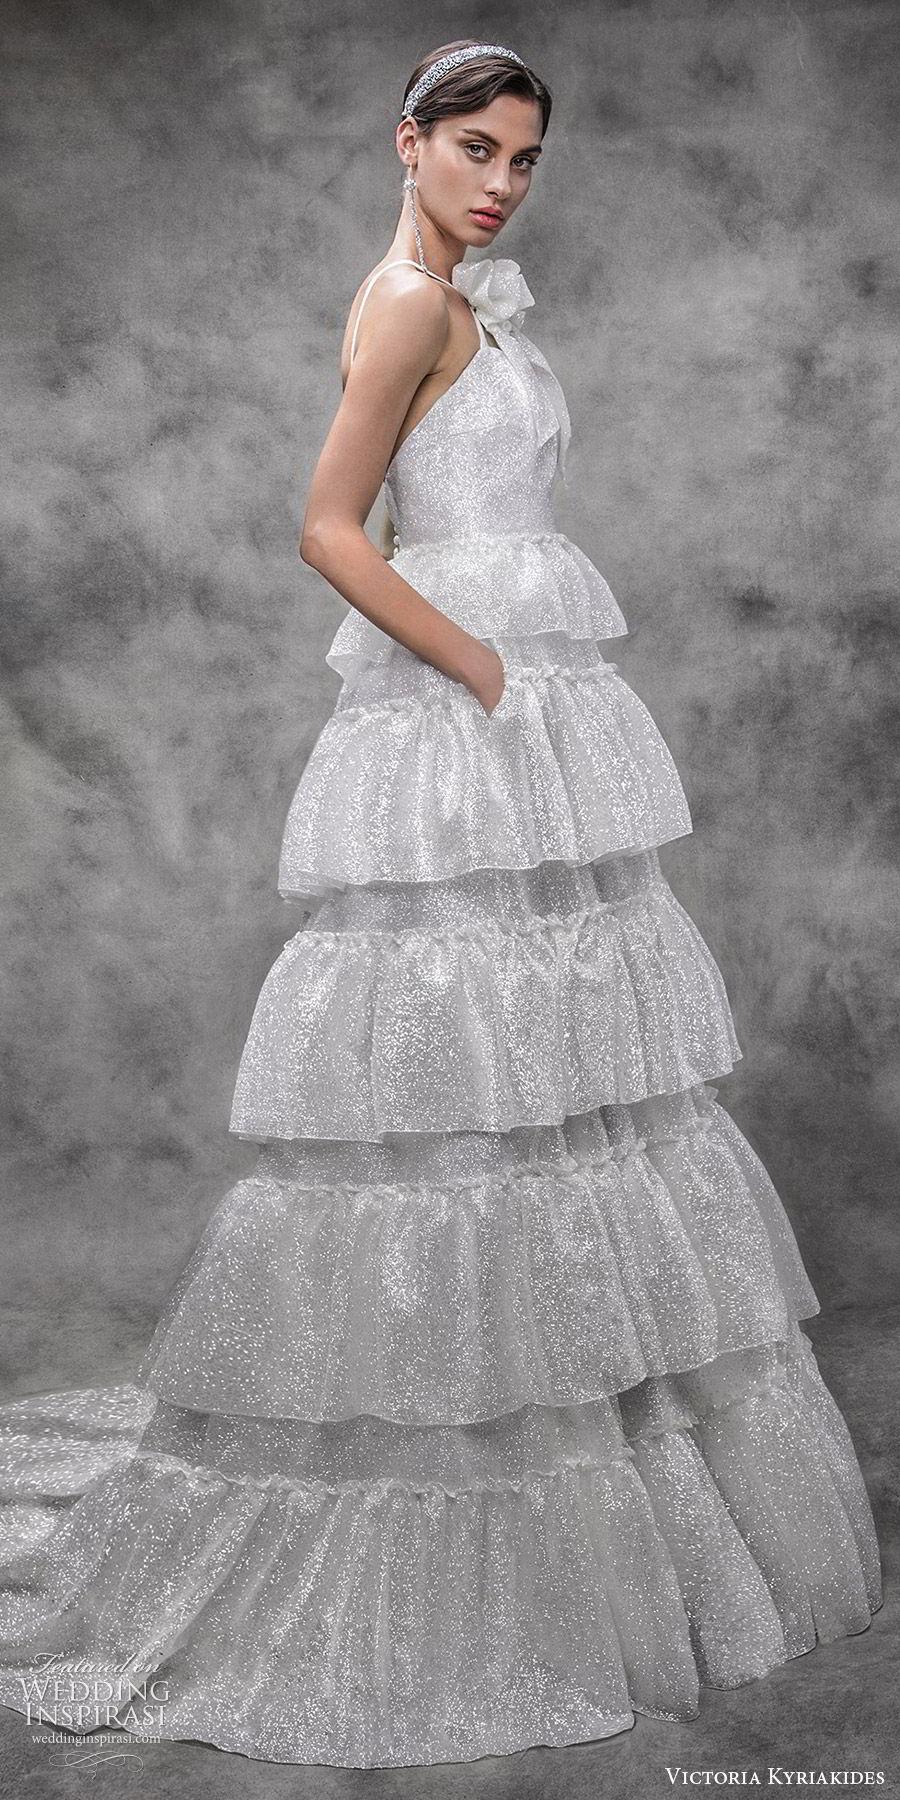 victoria kyriakides spring 2020 bridal sleeveless straps sweetheart tiered skirt a line ball gown wedding dress (6) pockets chapel train glitzy modern mv